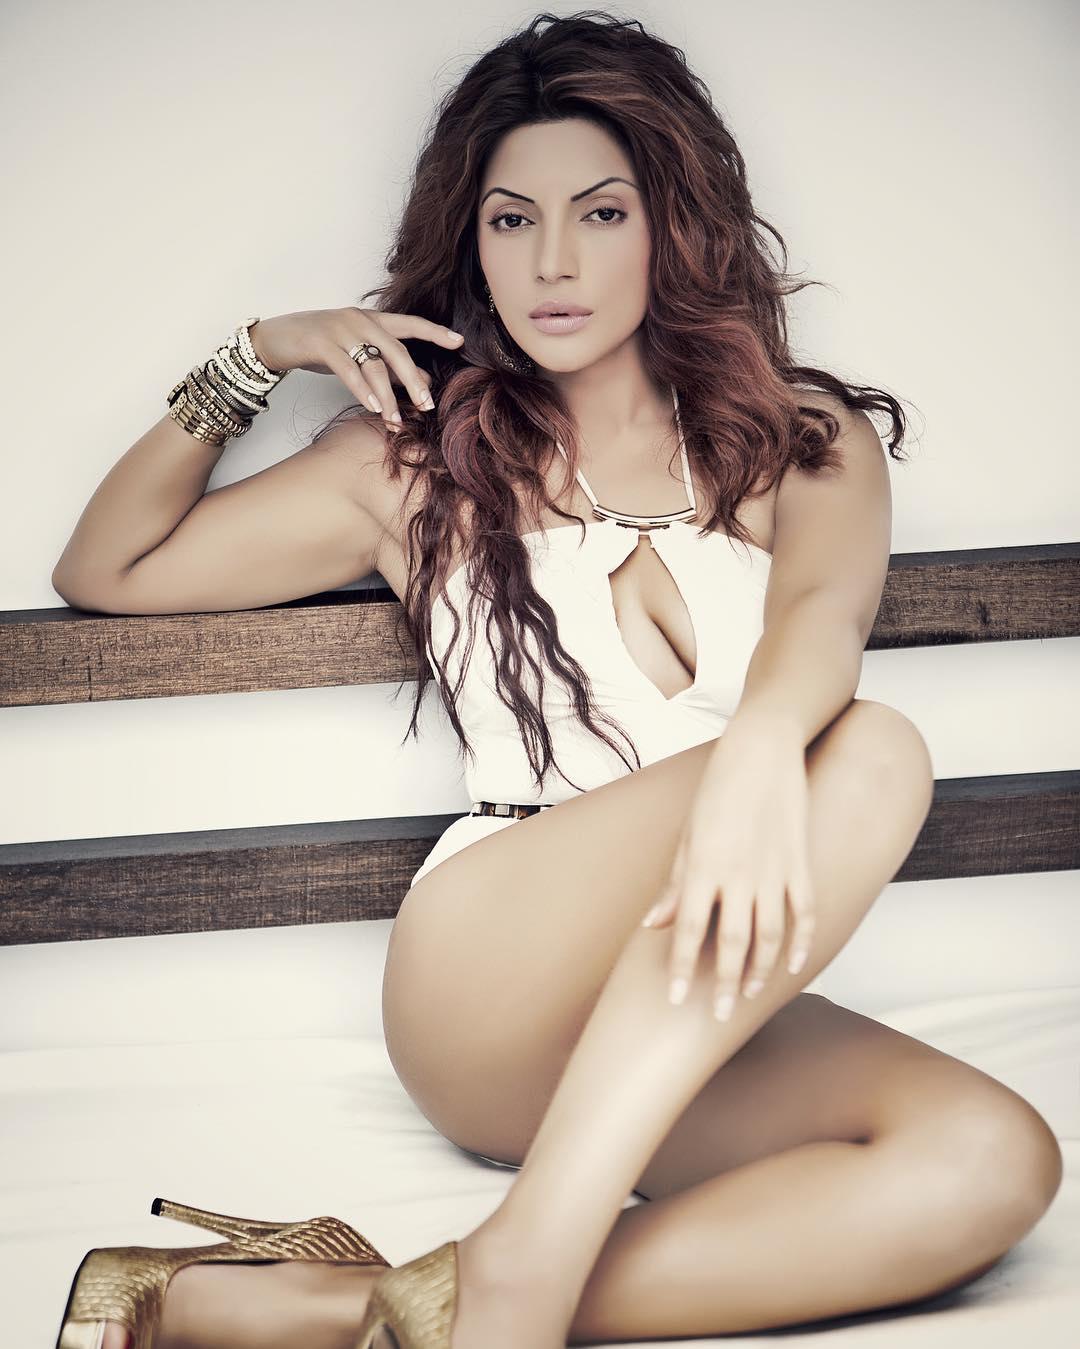 Shama Sikander hot legs, Shama Sikander sexy feet, Shama Sikander in high heels, Television actress hottest photos